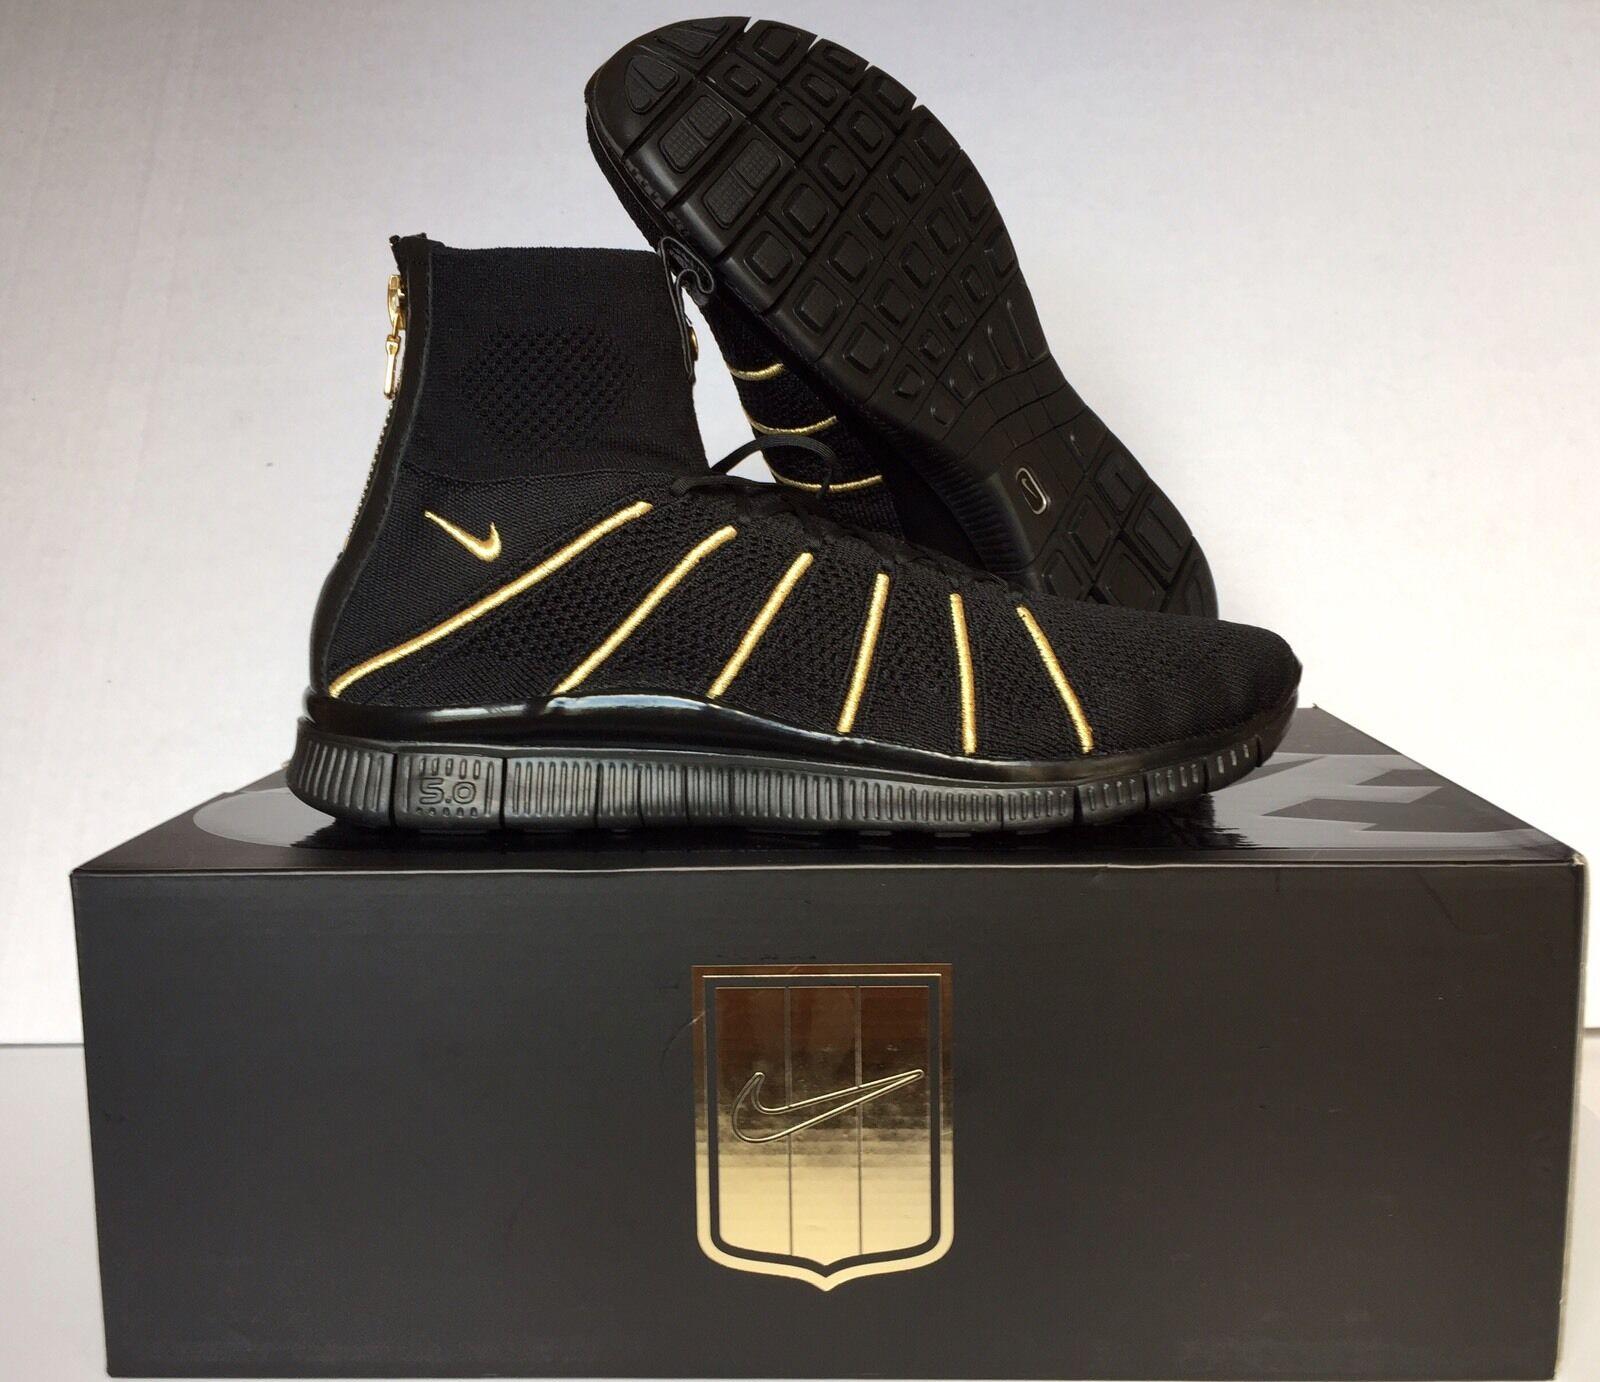 Nike free flyknit sprunghafter balmain war olivier rousteing nikelab 834906 007 sz 9,5